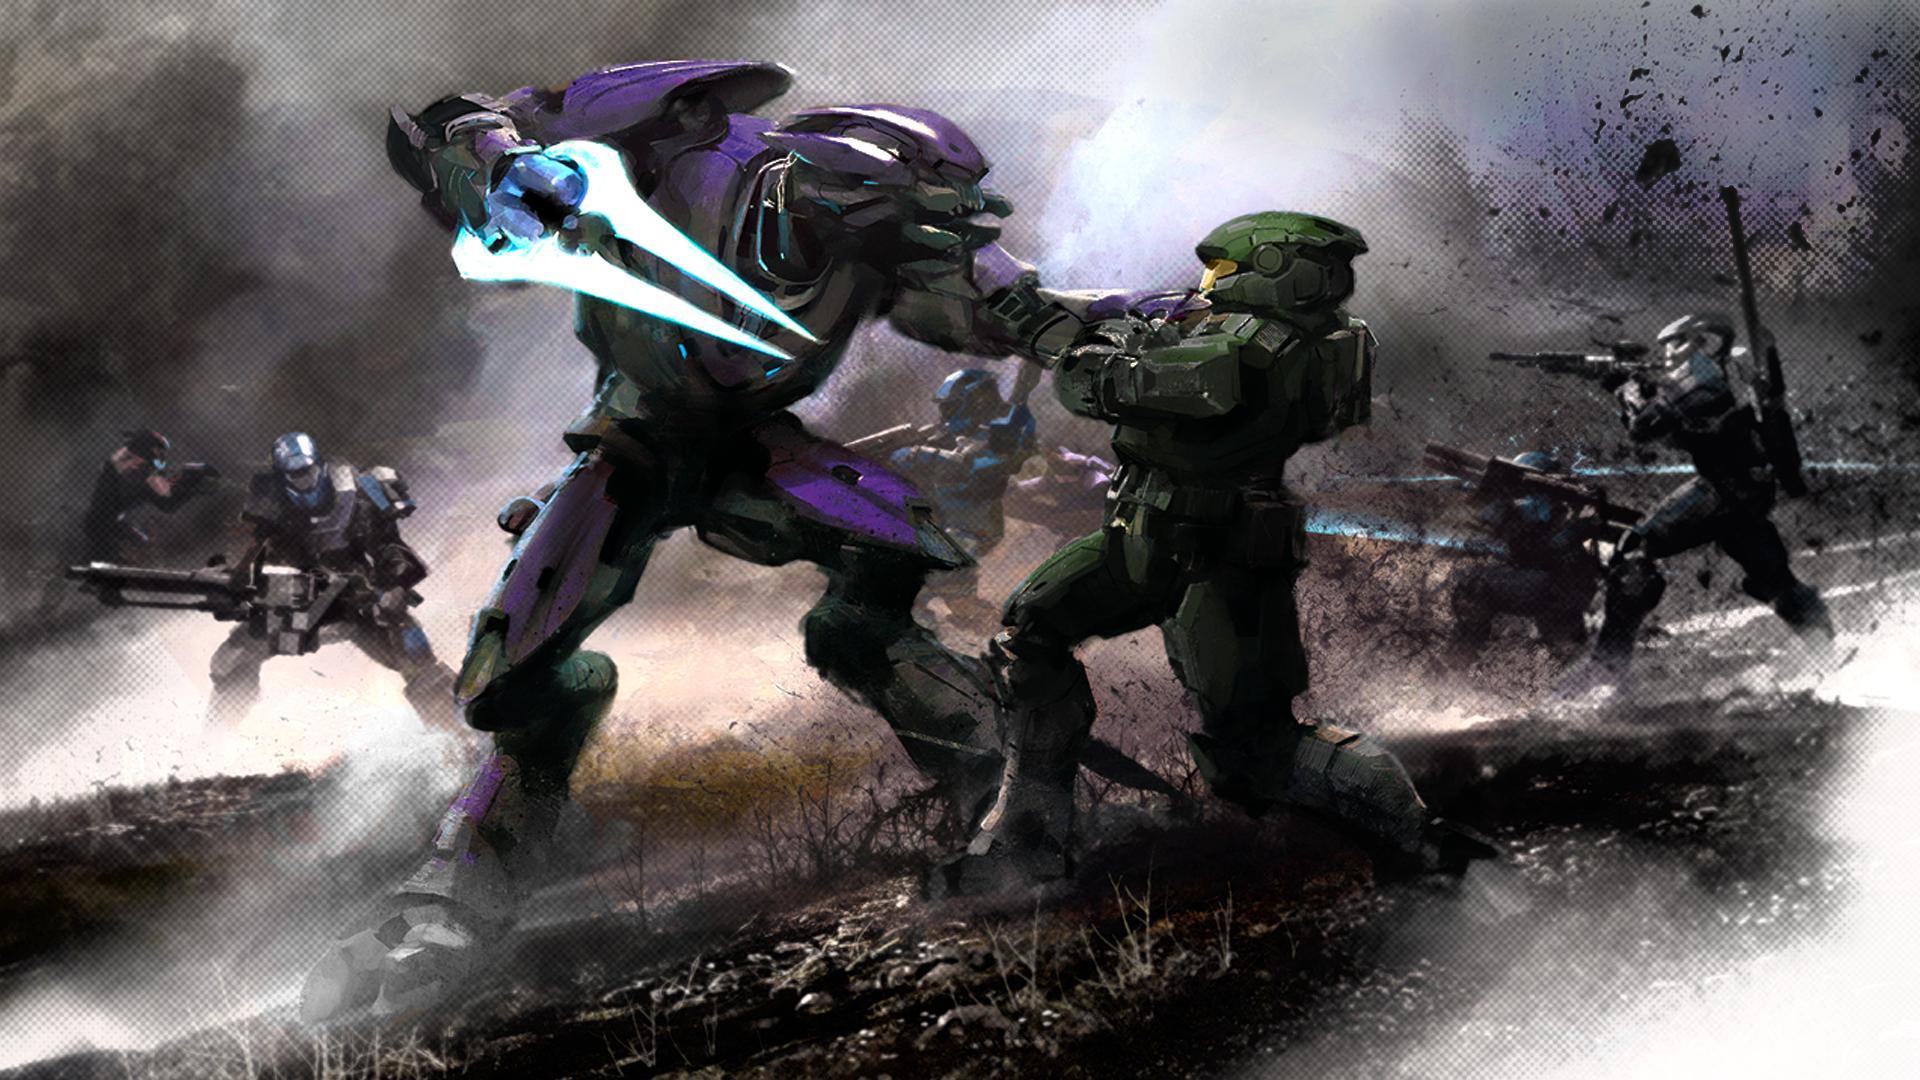 Halo Reach Elites Vs Spartans HD Wallpaper Background Images 1920x1080